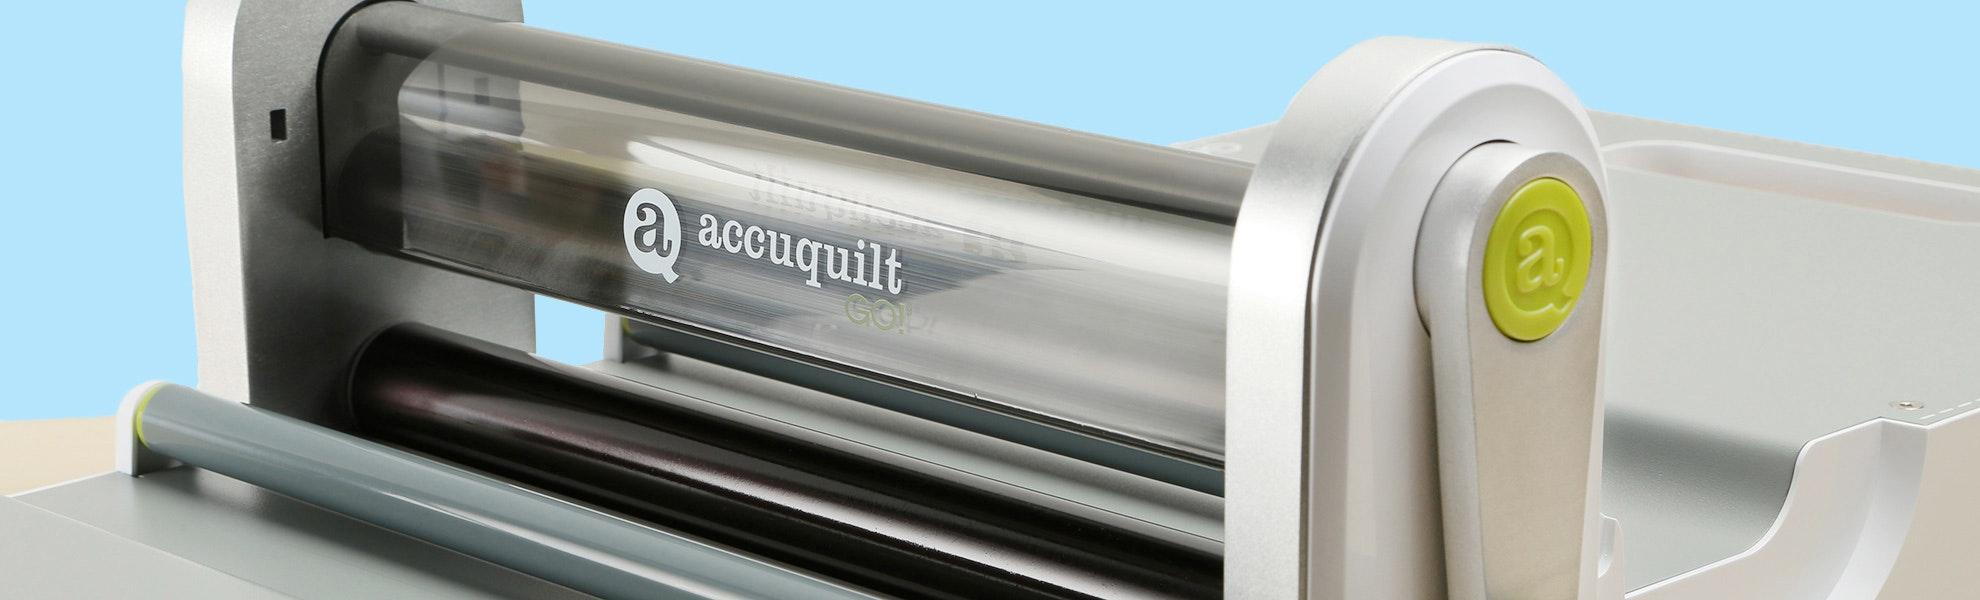 AccuQuilt GO! Fabric Cutter